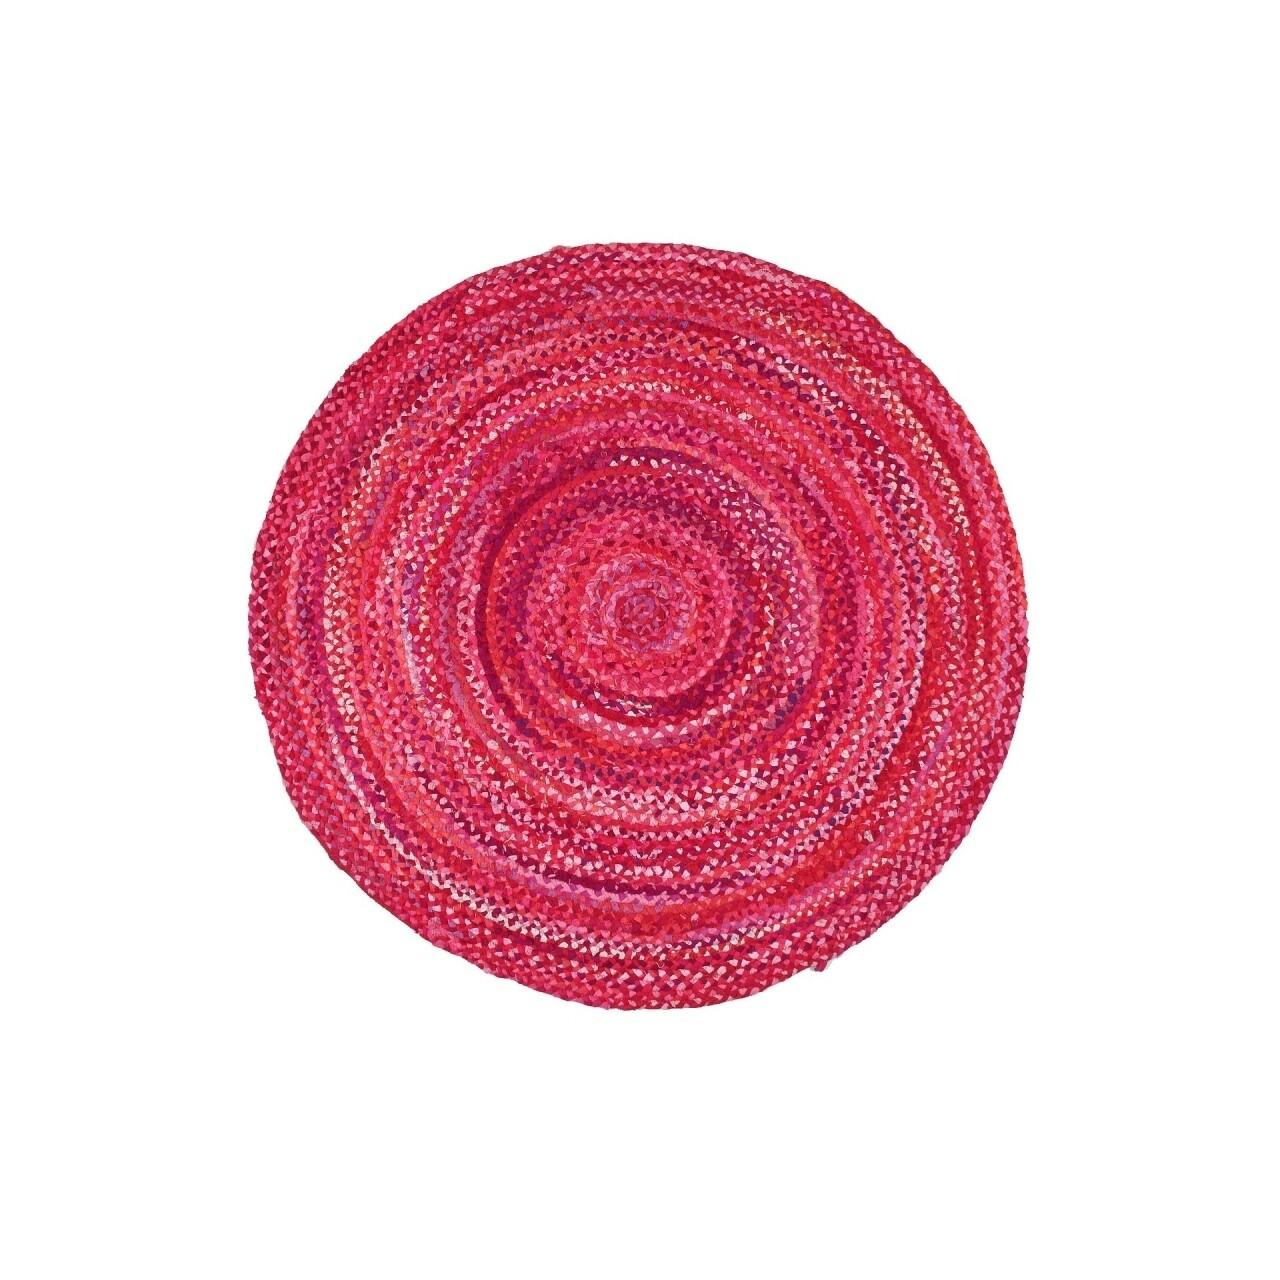 Covor lucrat manual Eko, MX 08 - Pink Q, 100% bumbac,  150 cm Ø